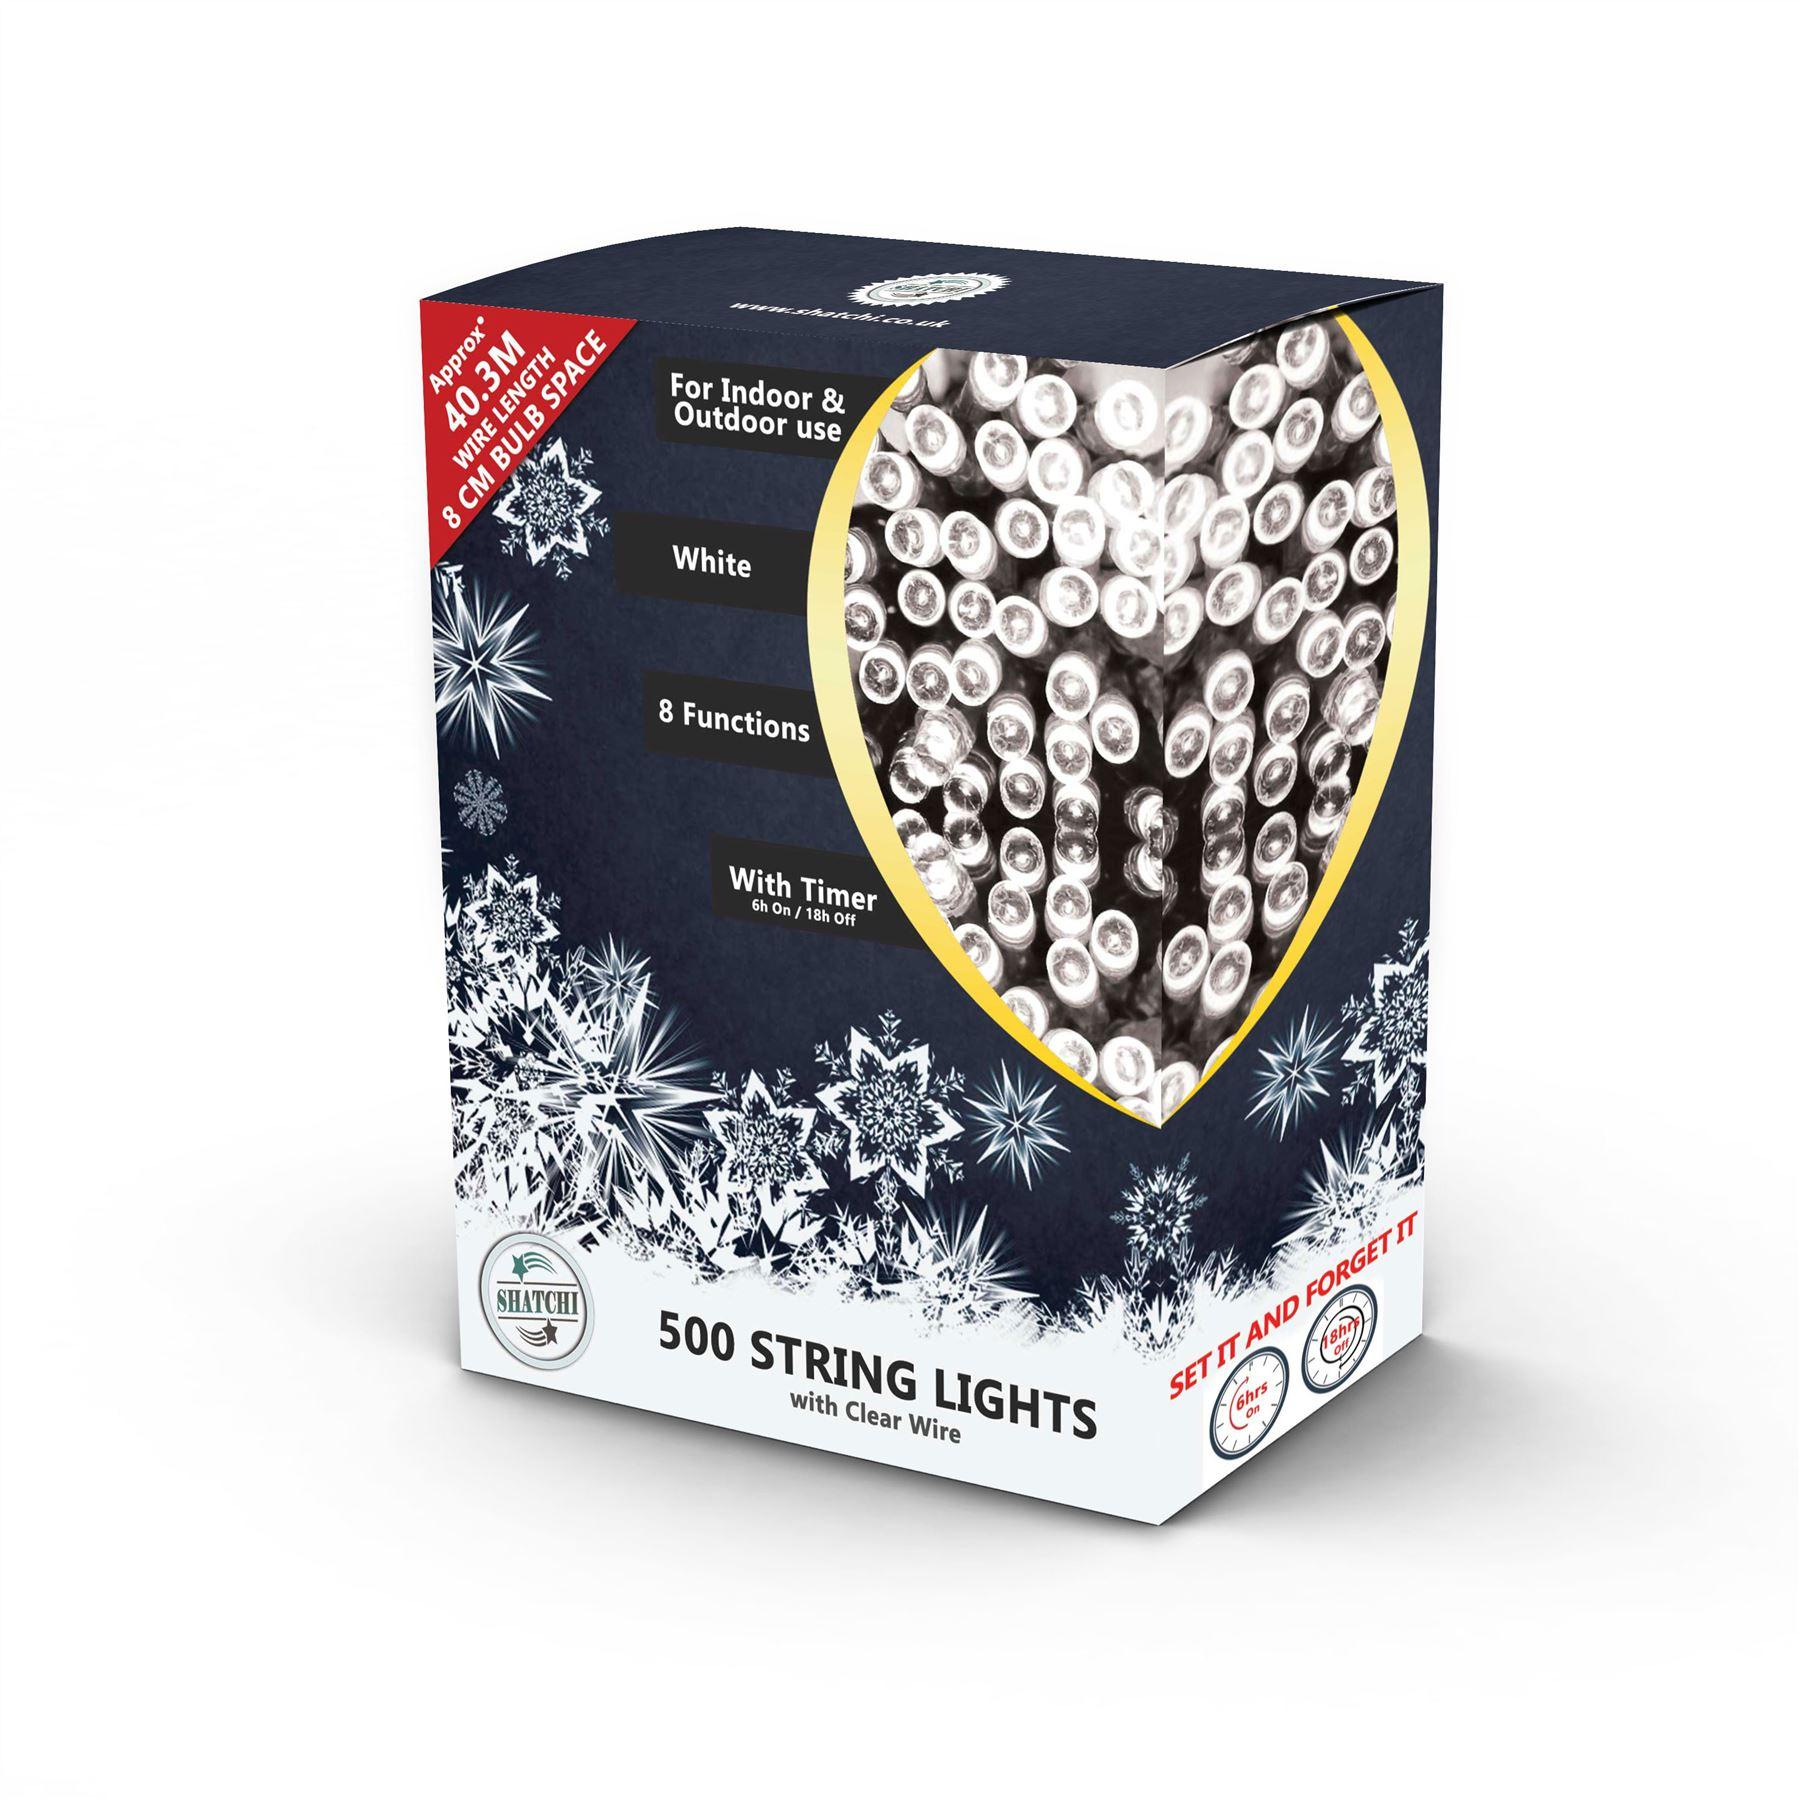 100-200-300-400-500-LED-Christmas-String-Fairy-Lights-Xmas-Decorations-Tree miniature 18